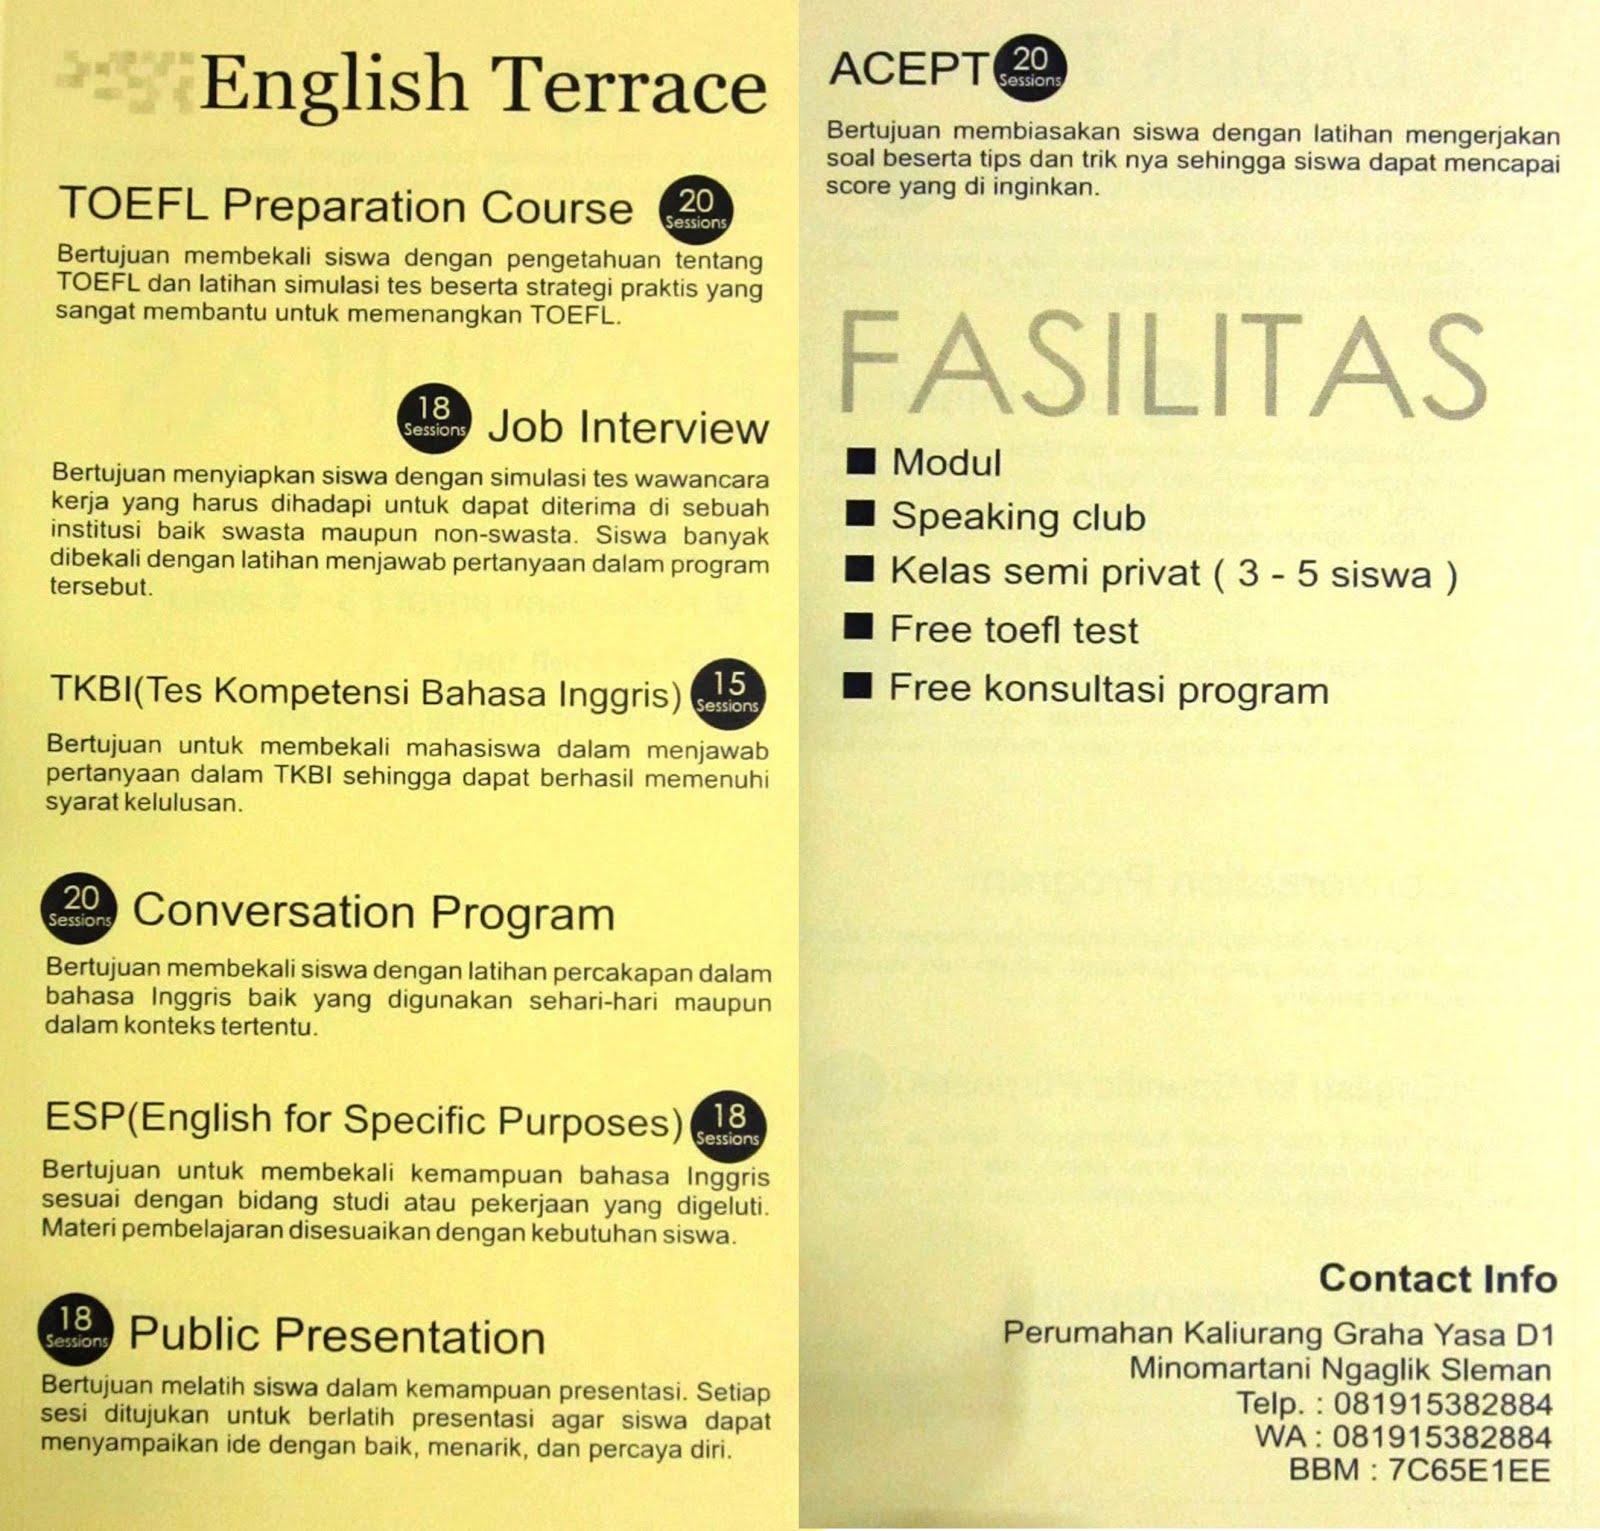 ENGLISH TERRACE